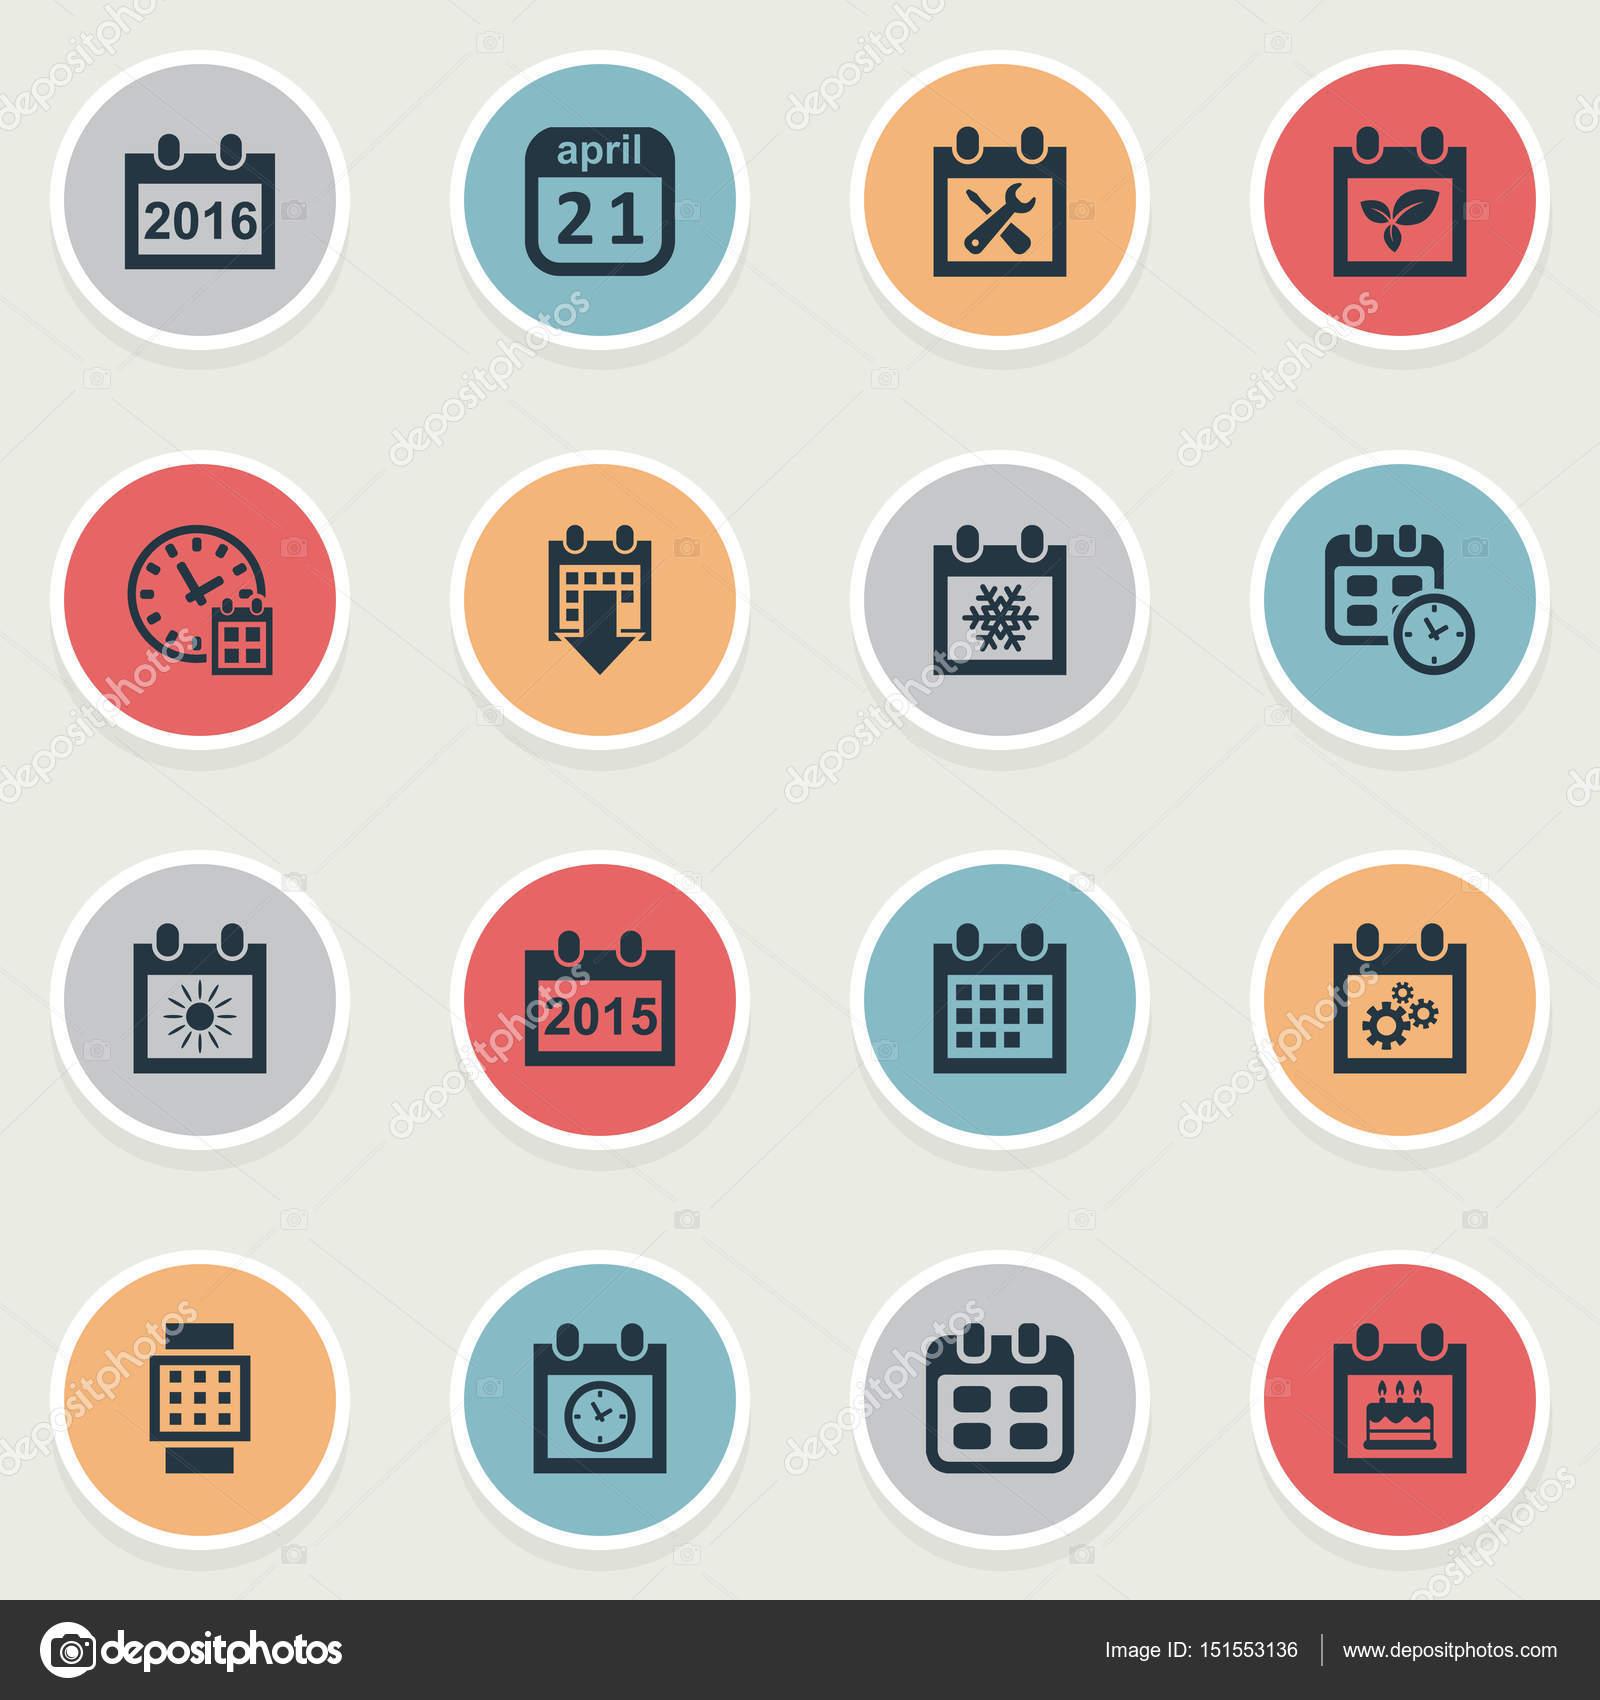 vector illustration set of simple plan icons elements intelligent